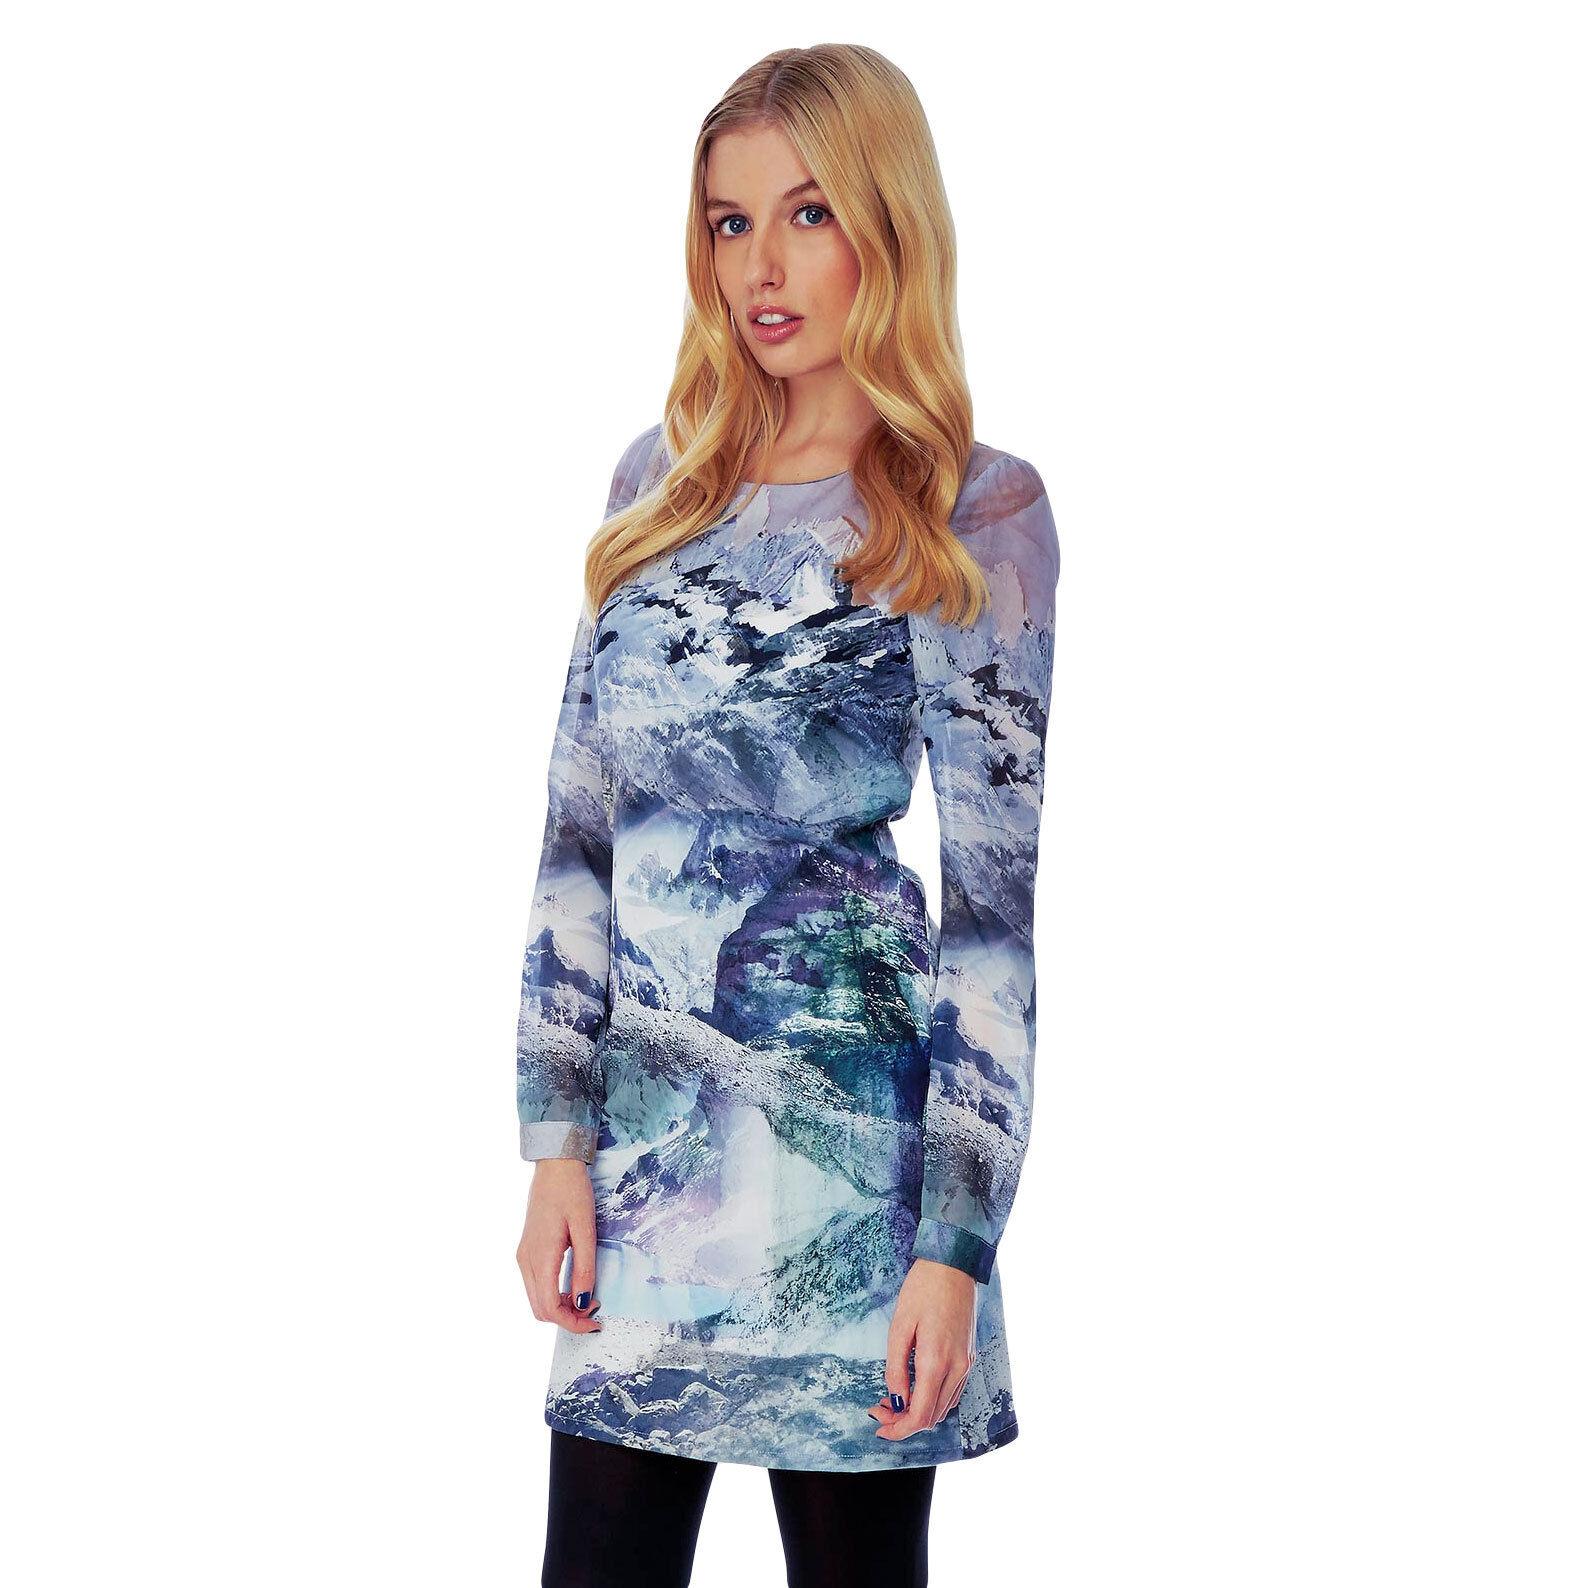 %Yumi Mountain Print Tunic Kleid multi XS-M ()